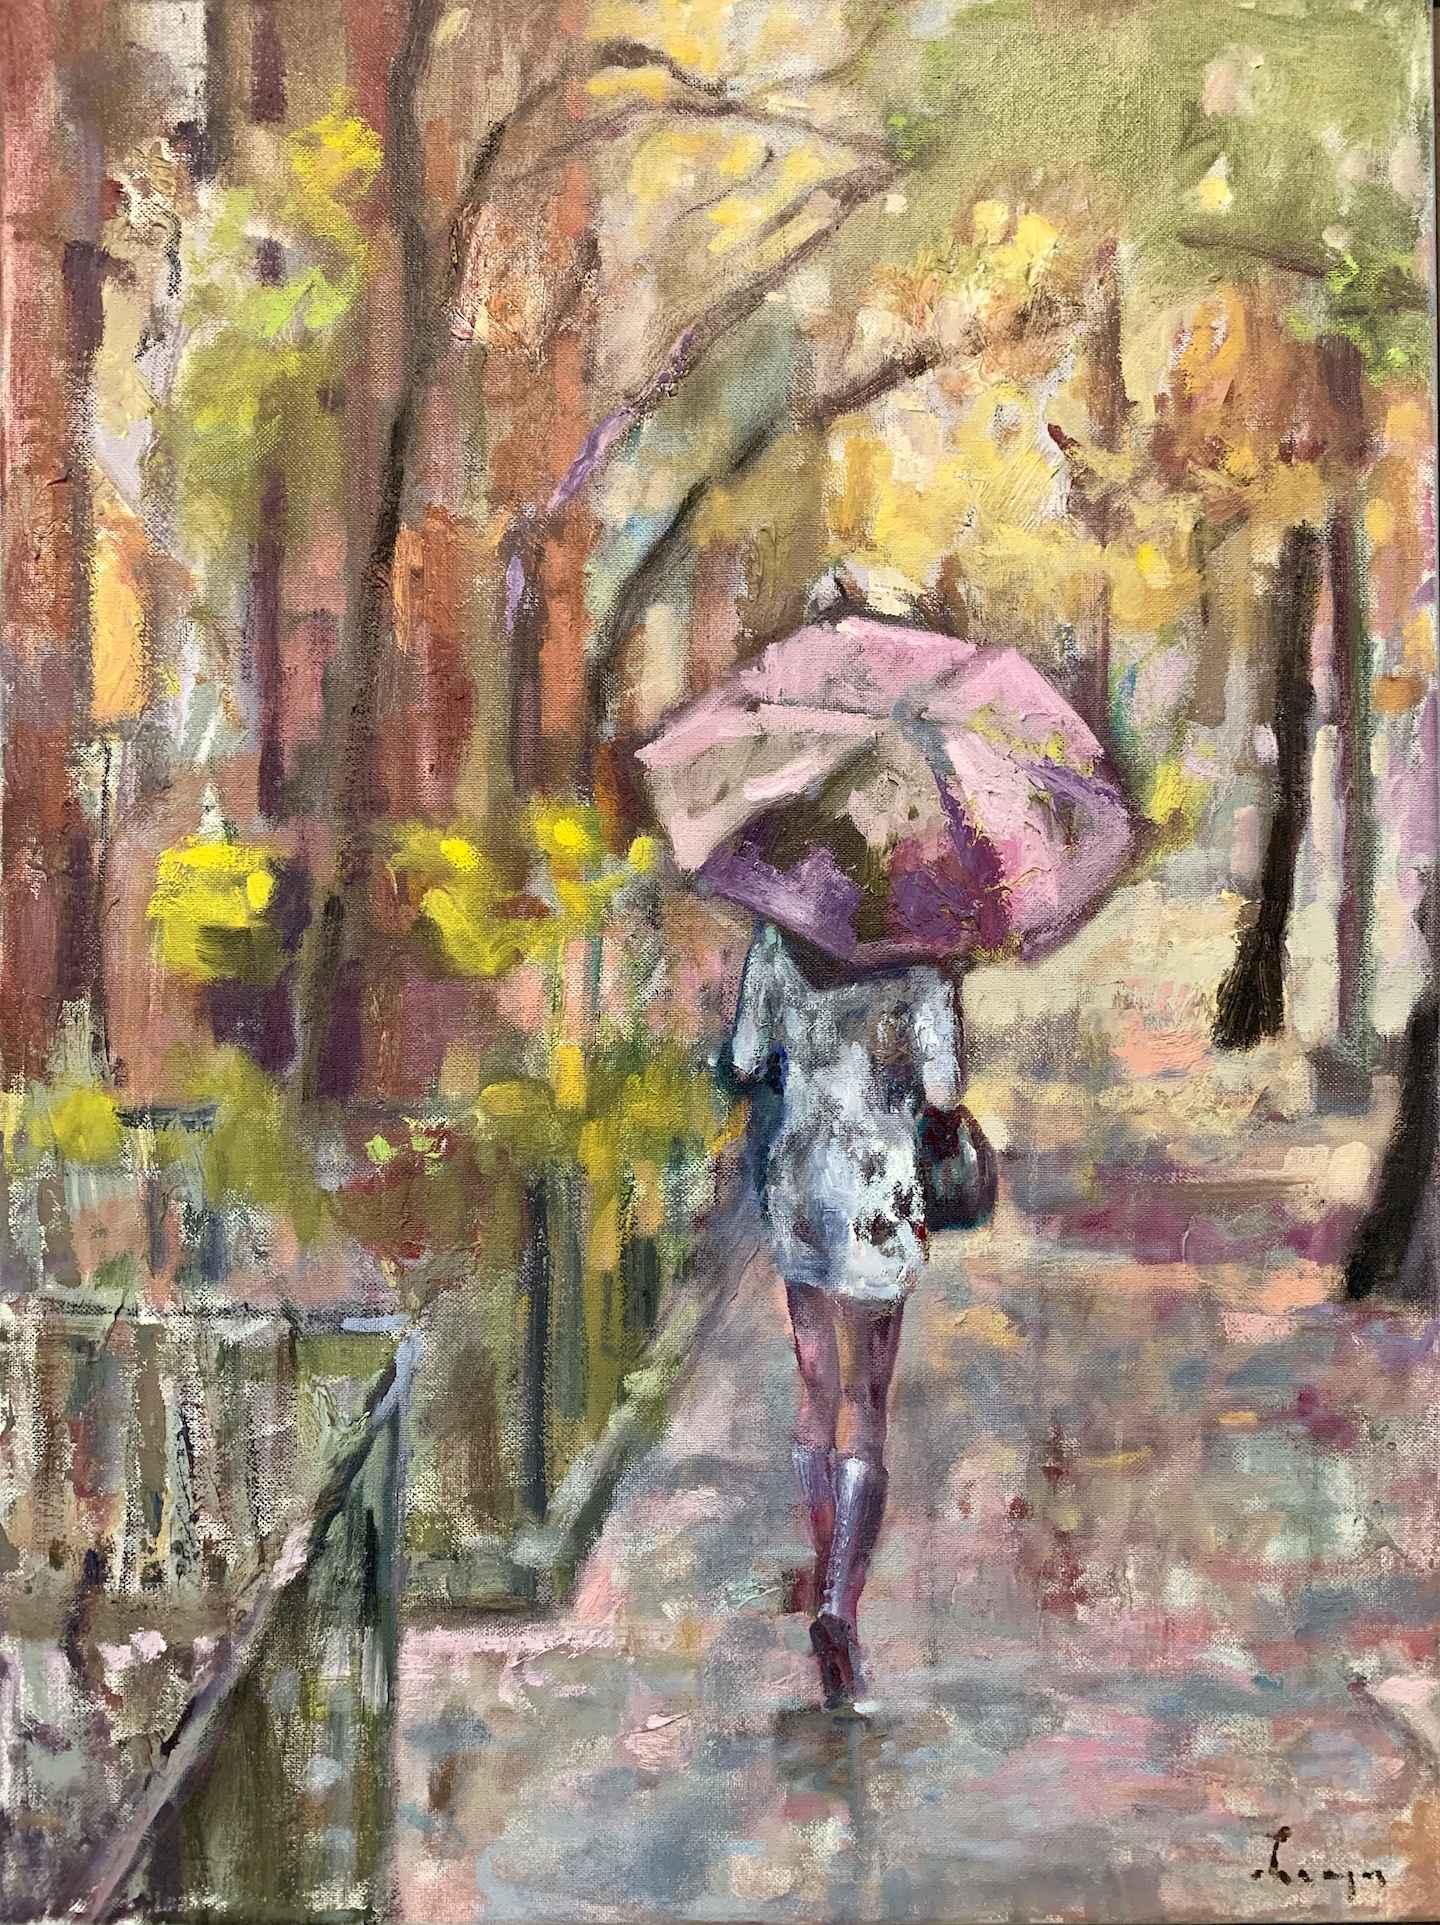 Summer Rain by  Traeger di Pietro - Masterpiece Online